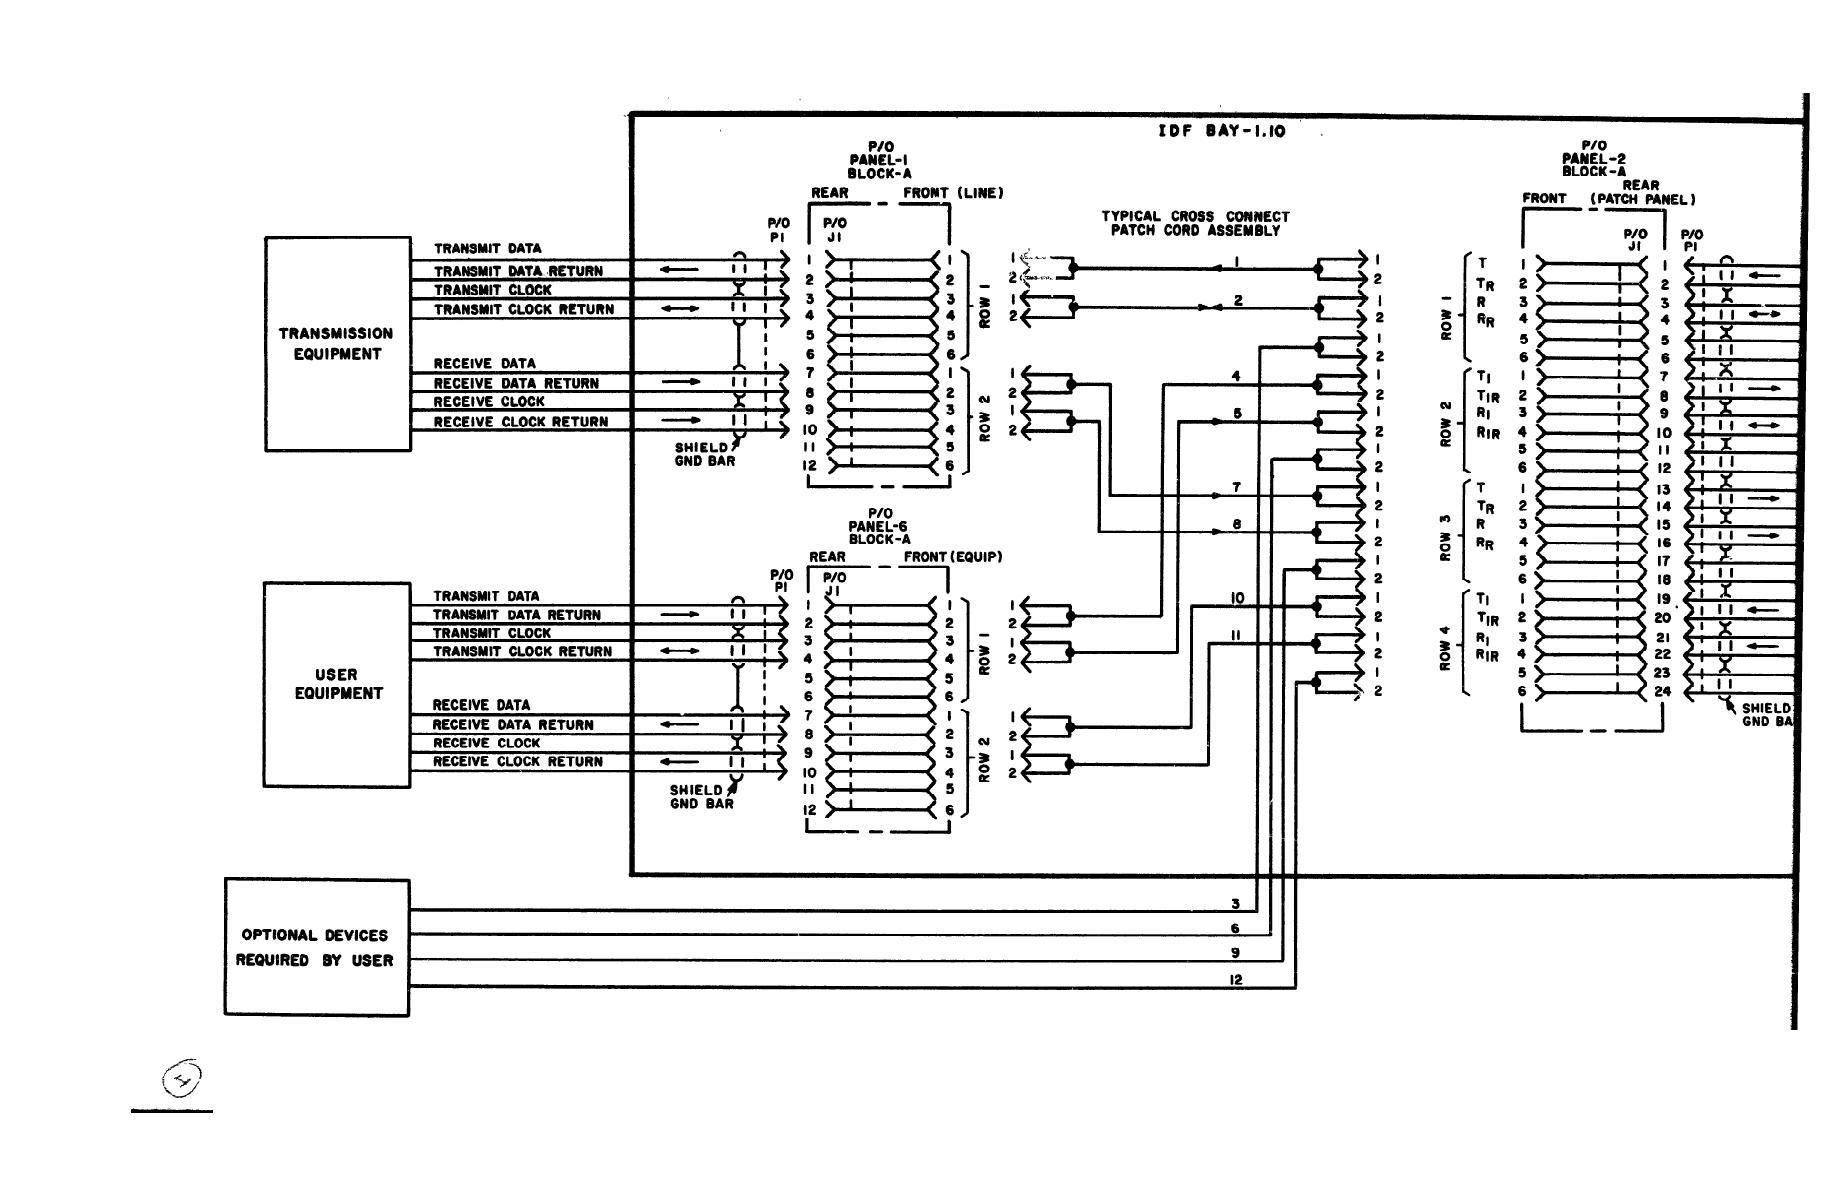 Figure Fo 13 Typical Black Digital Circuit Idf Connection